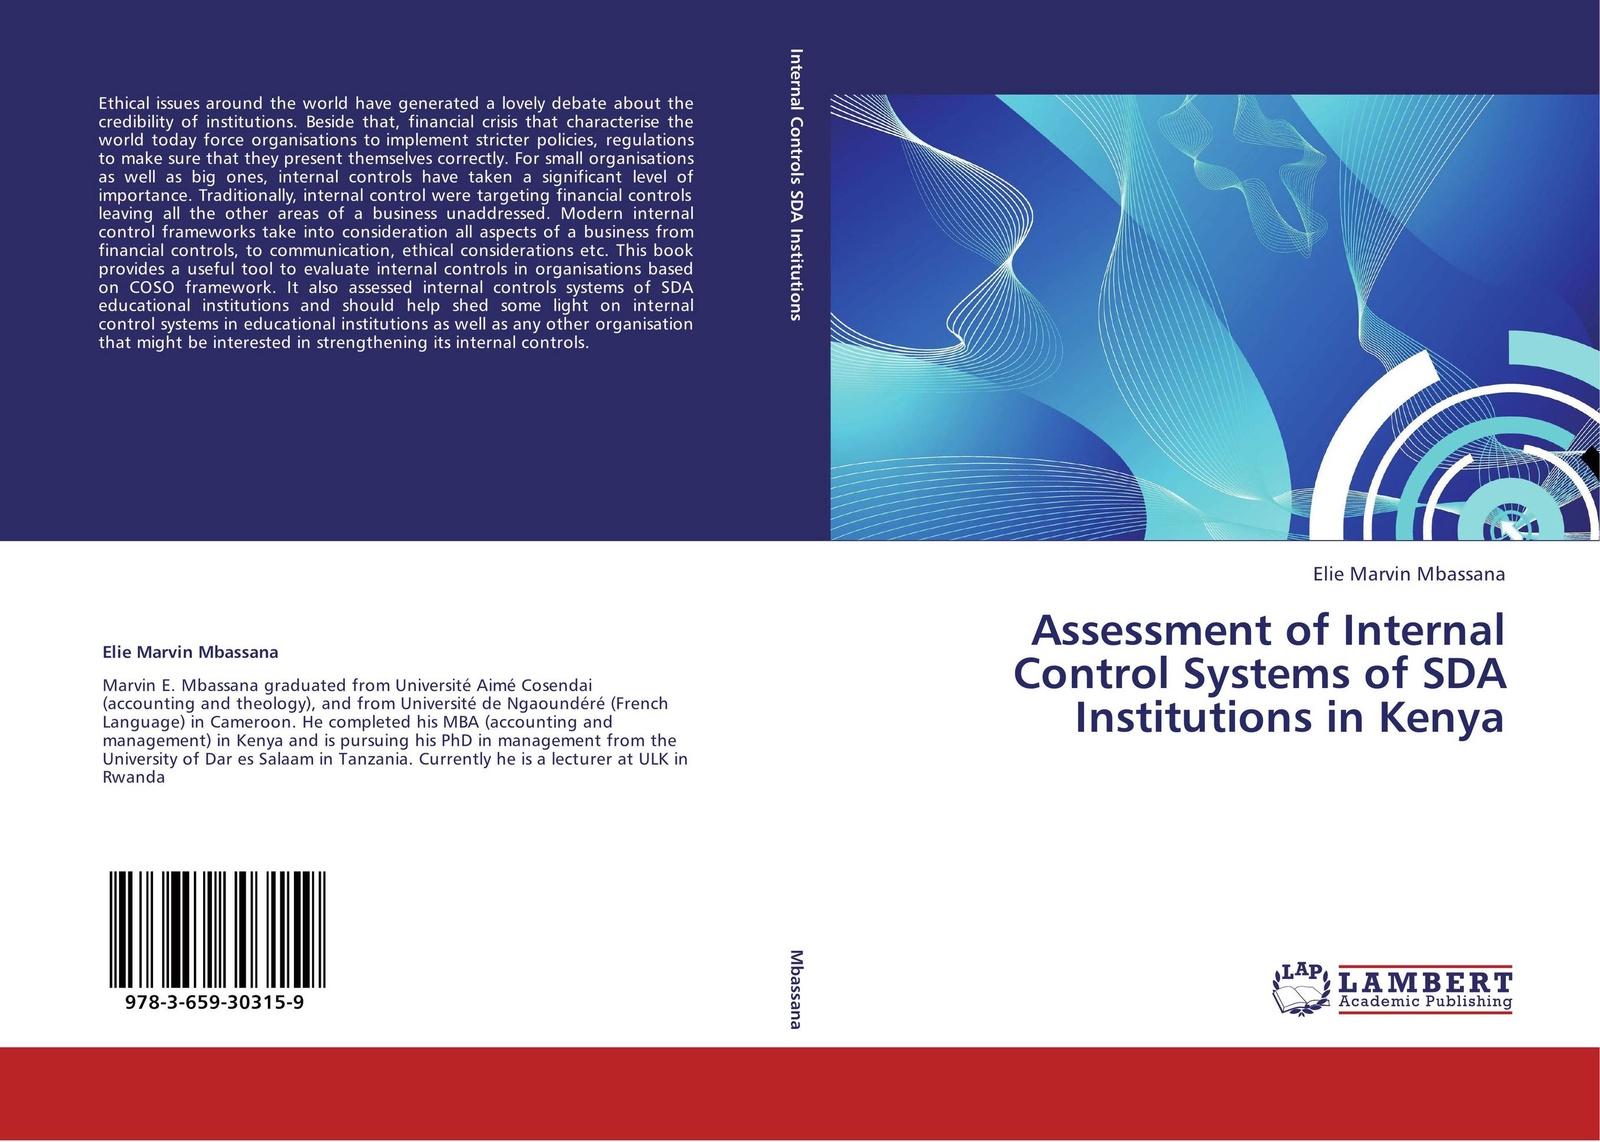 Elie Marvin Mbassana Assessment of Internal Control Systems of SDA Institutions in Kenya недорго, оригинальная цена